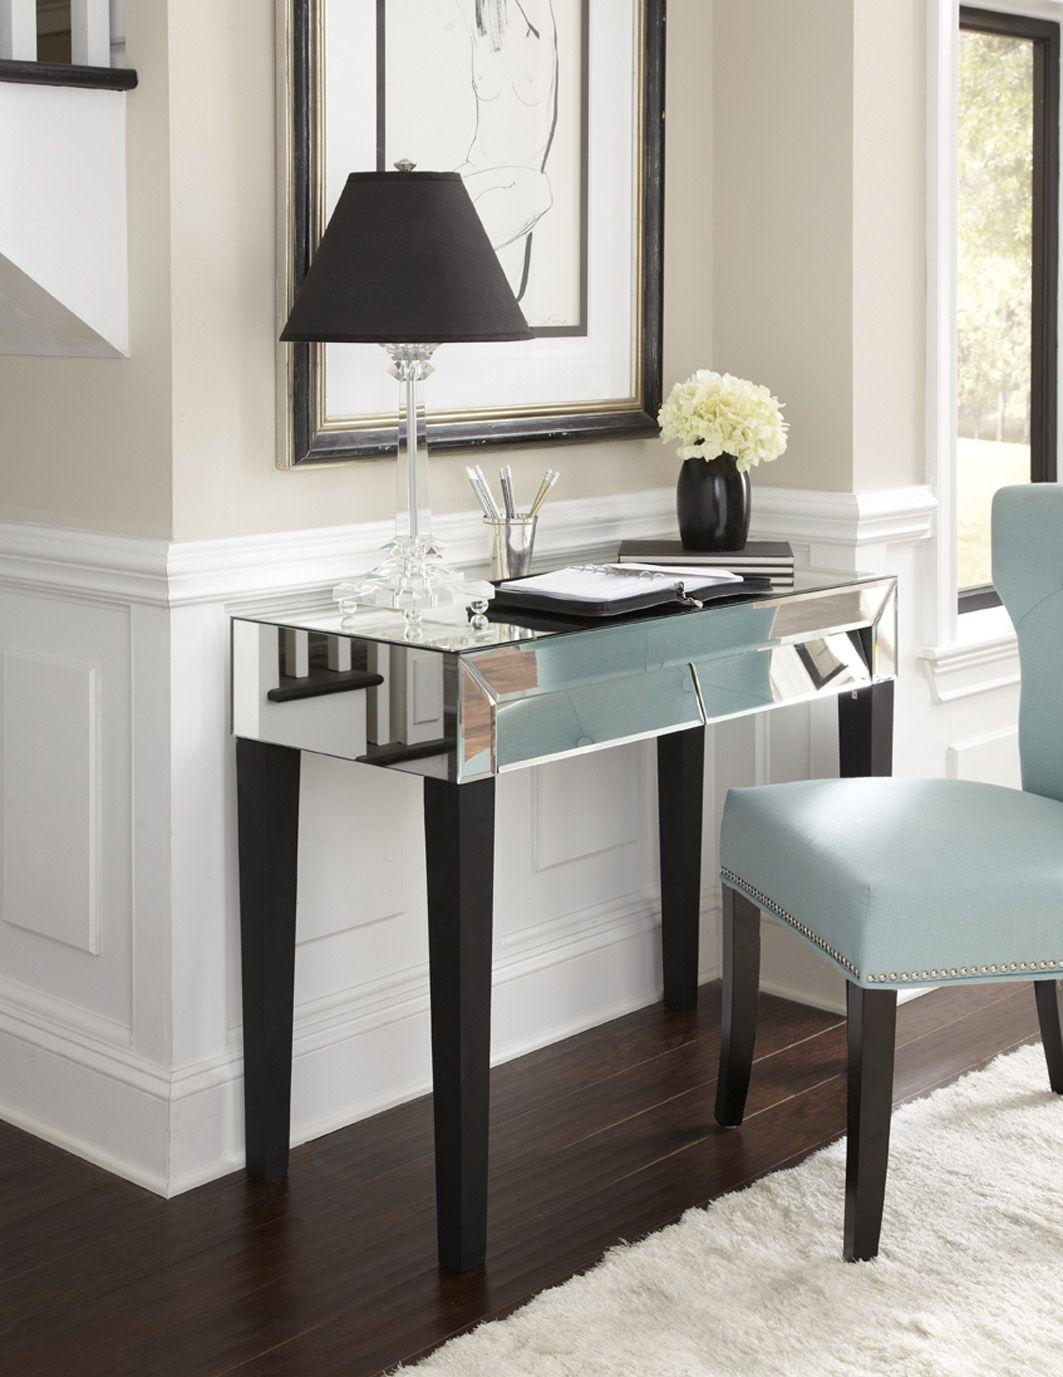 Stella Mirrored Desk Vanity From Glamfurniture 587 00